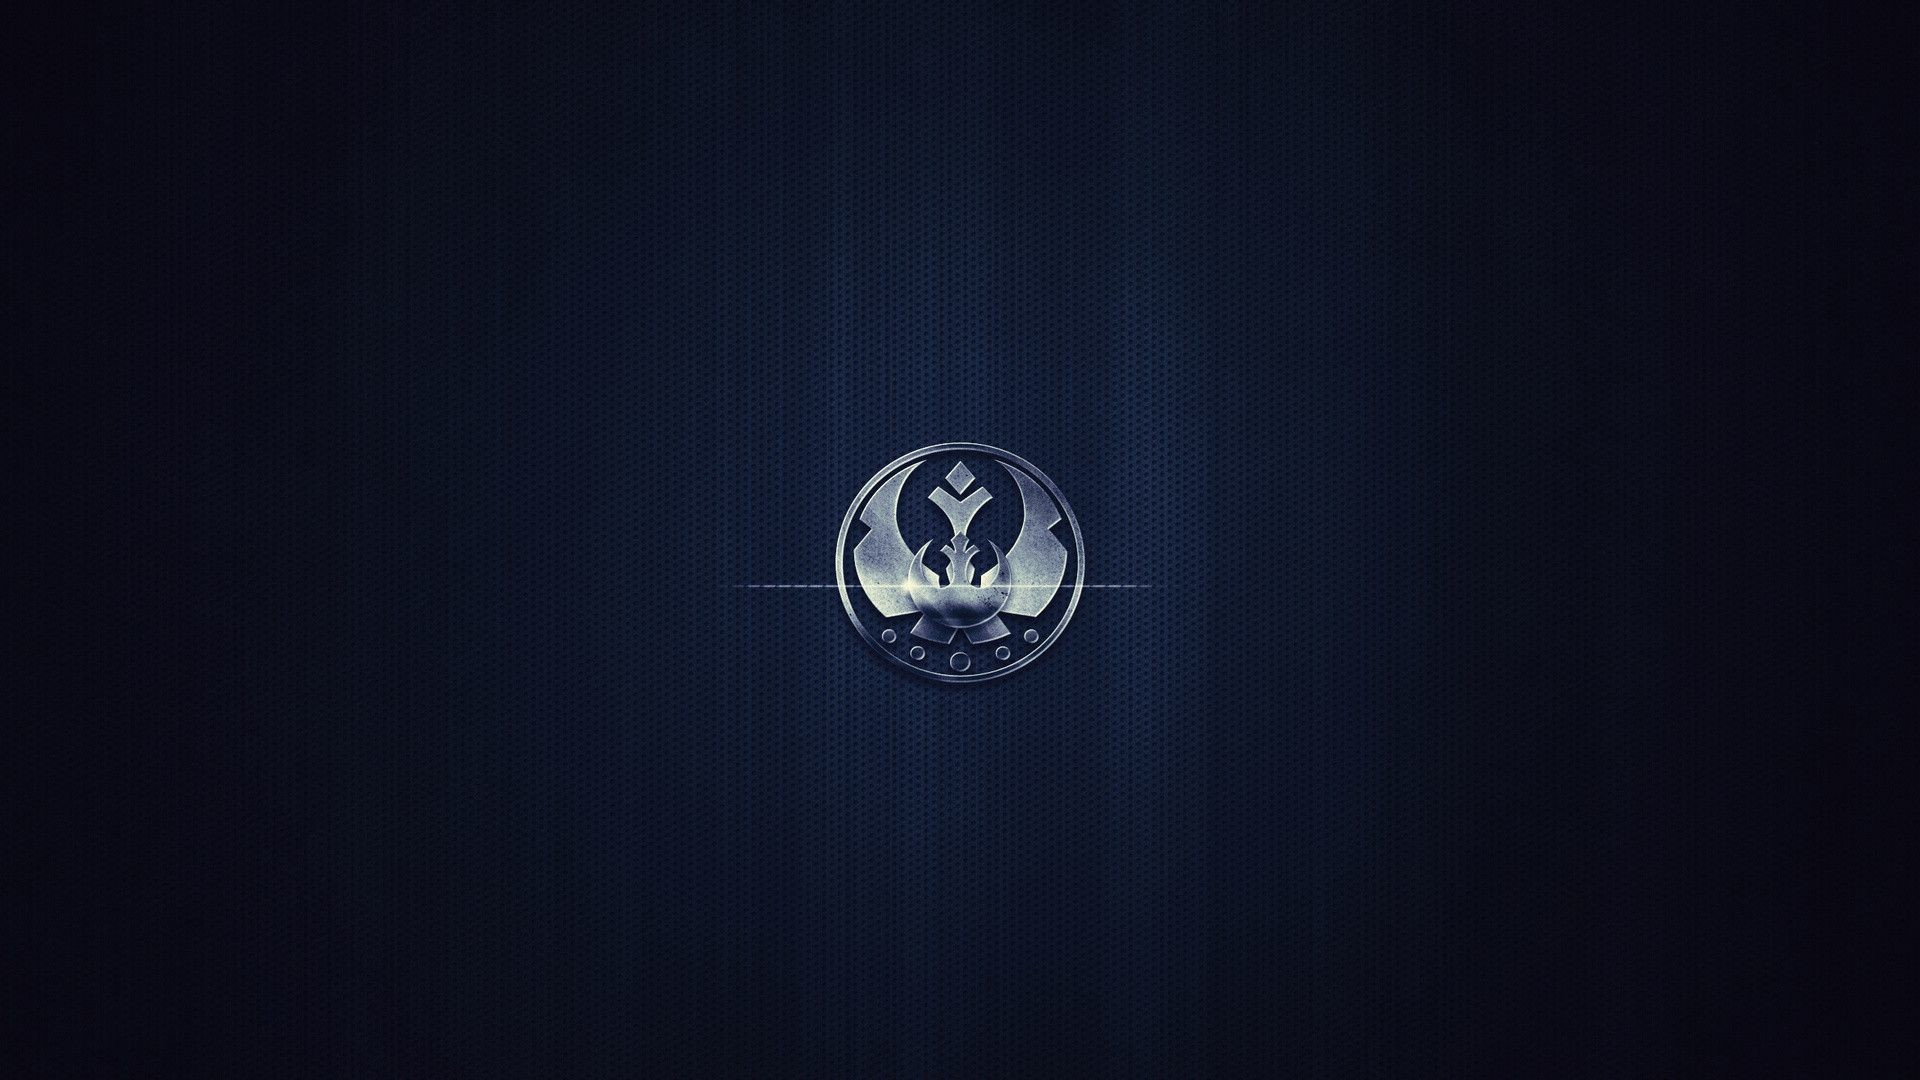 Star Wars Logo Wallpaper – Wallpapers Browse